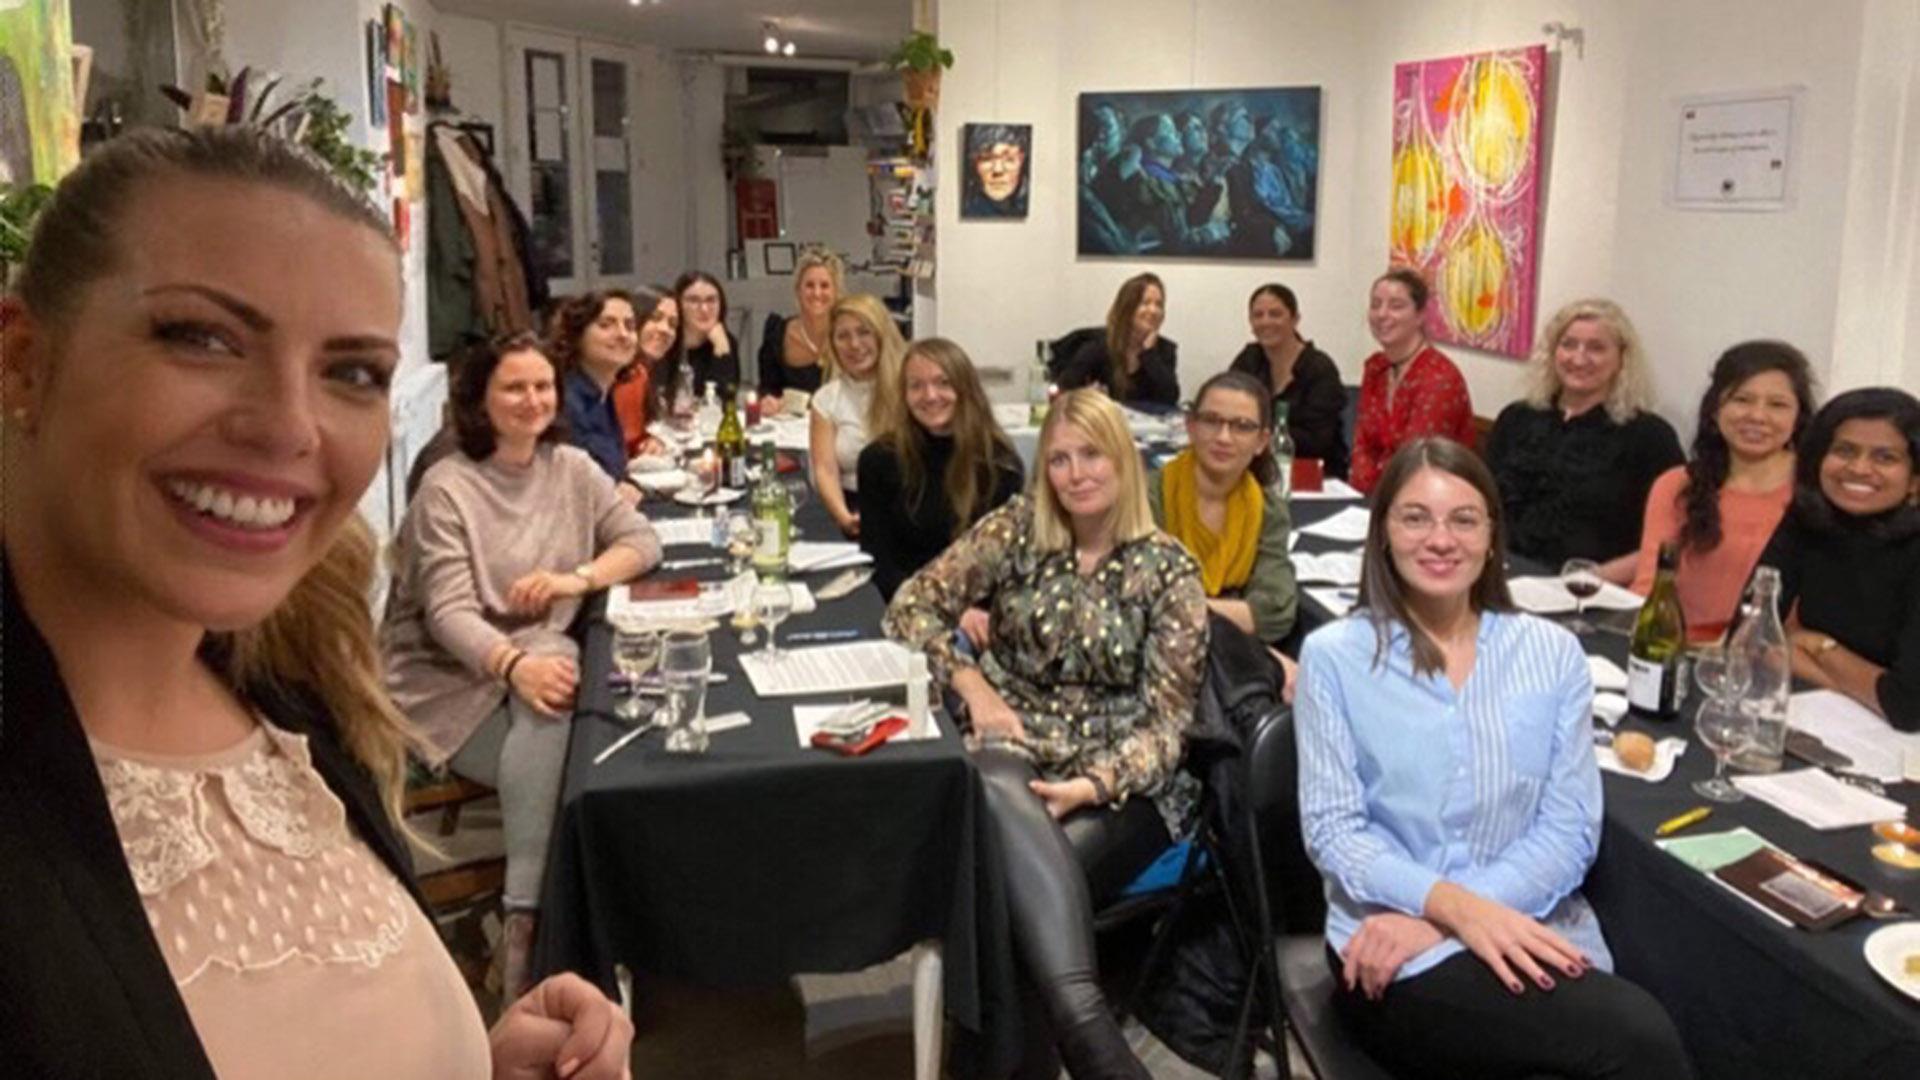 Career-Club-DK-Advisory-Board-Members-meeting